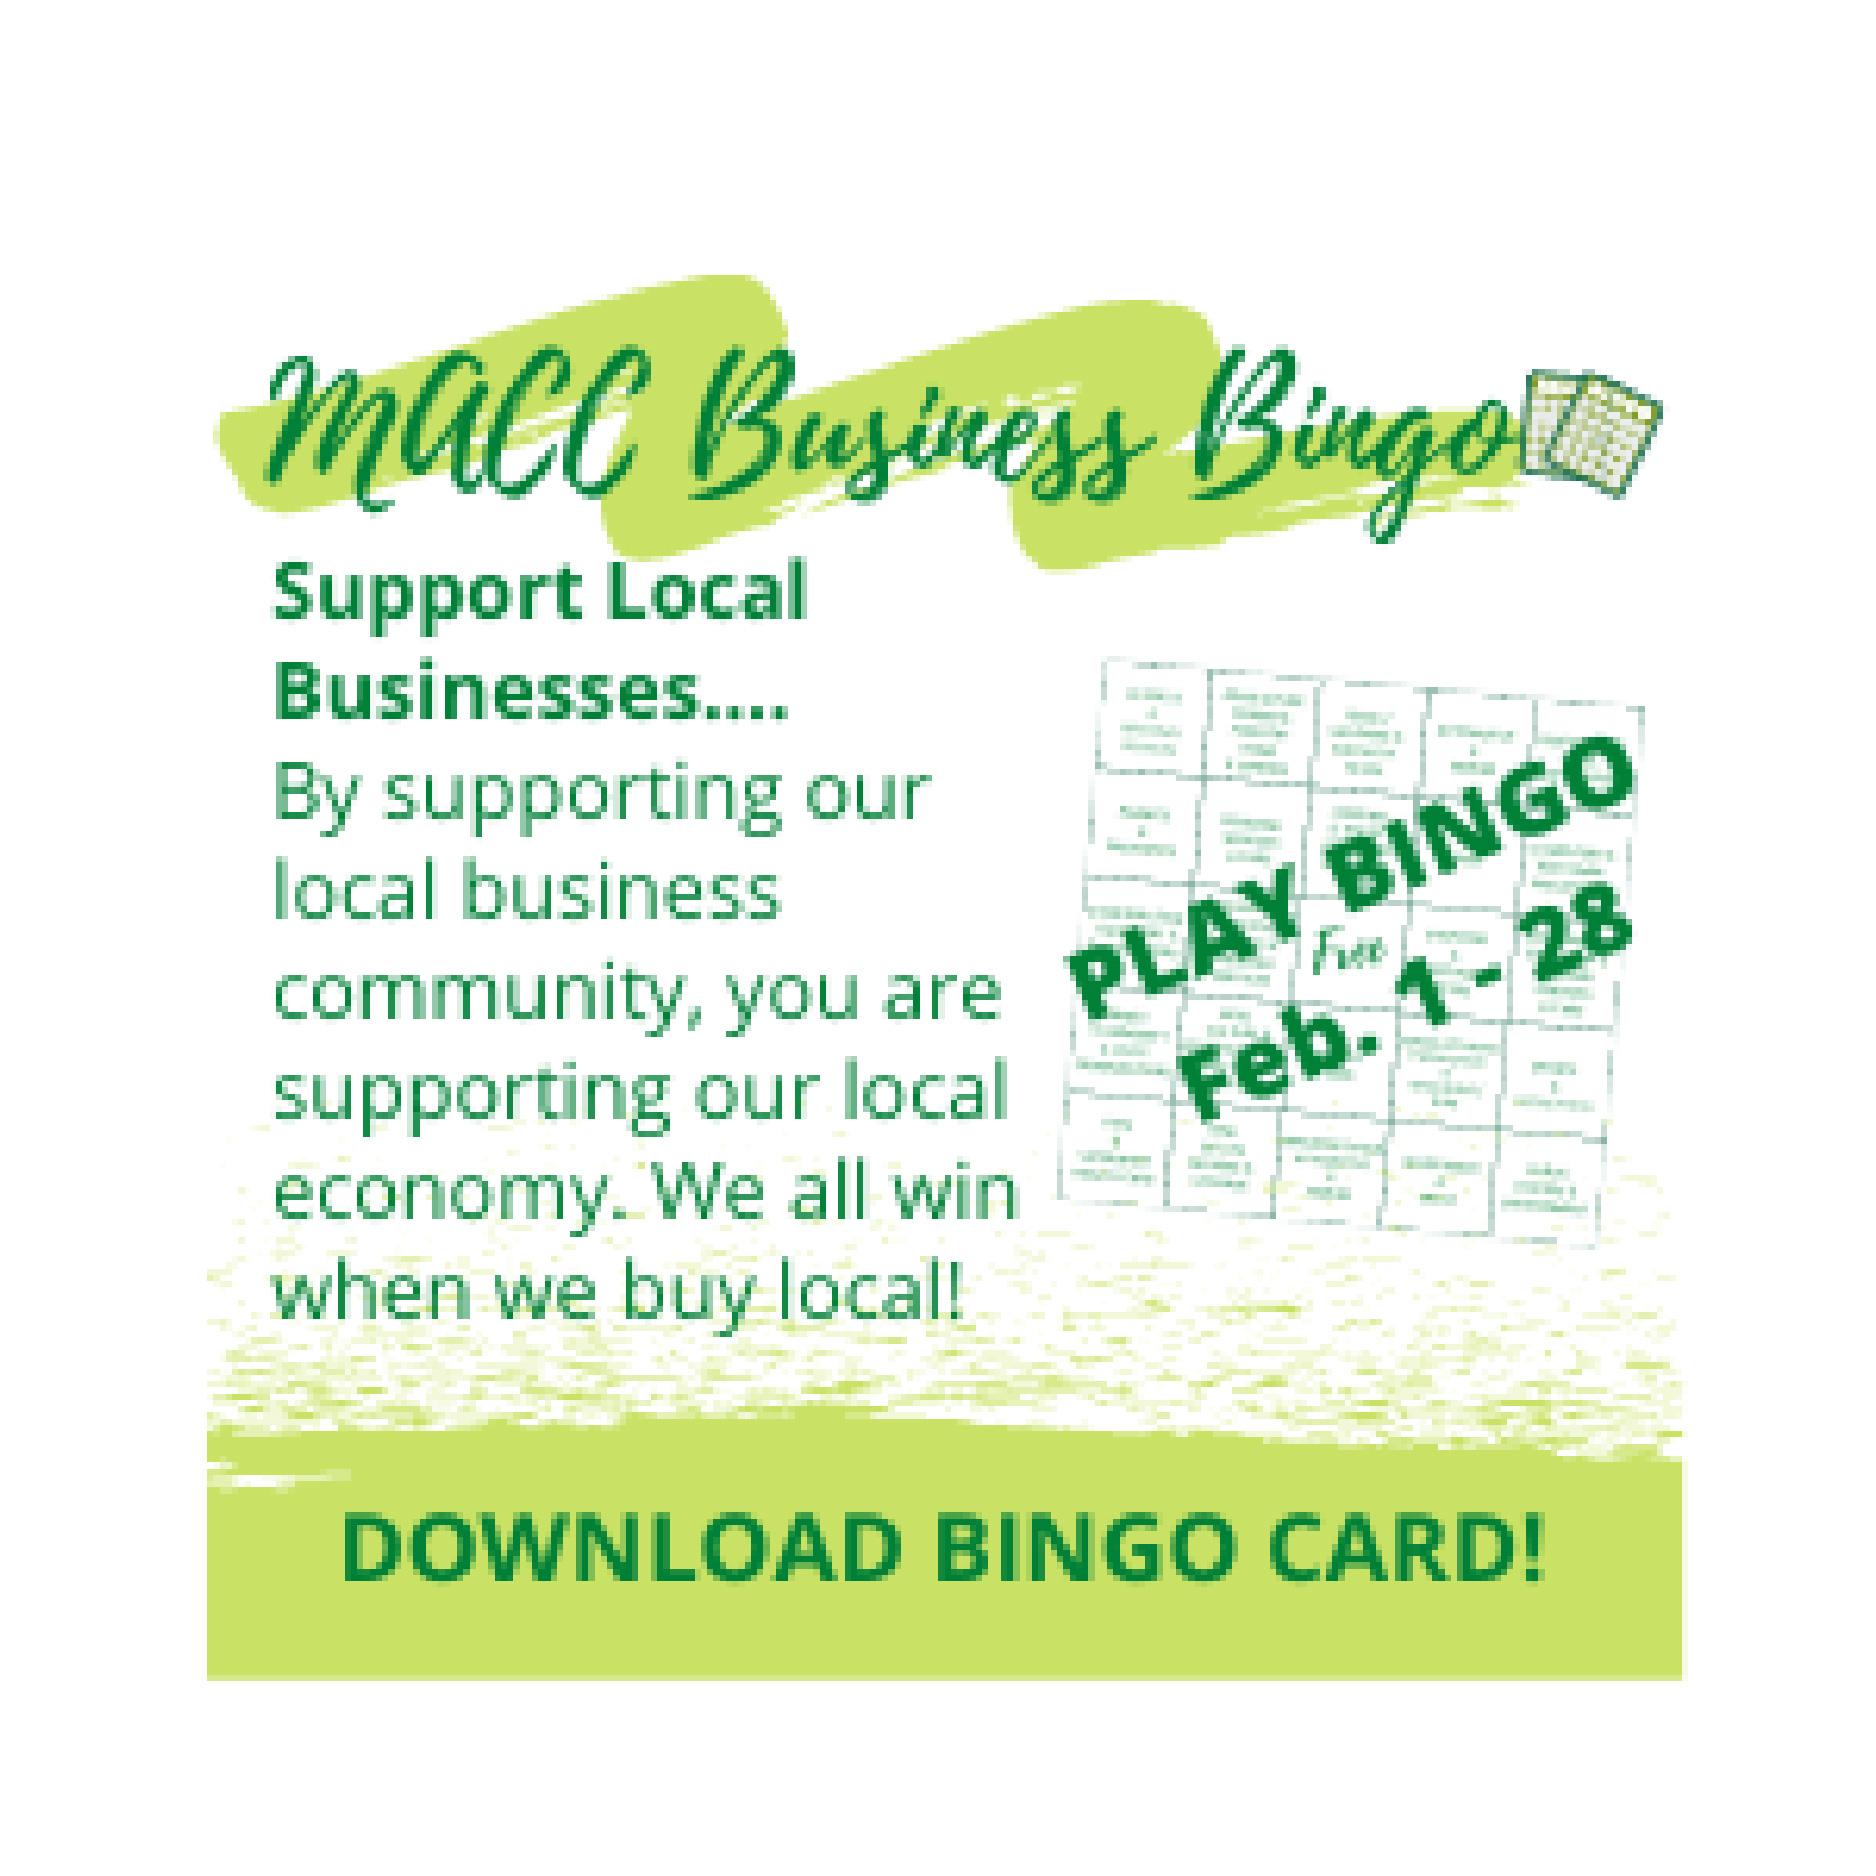 MACC Business Bingo